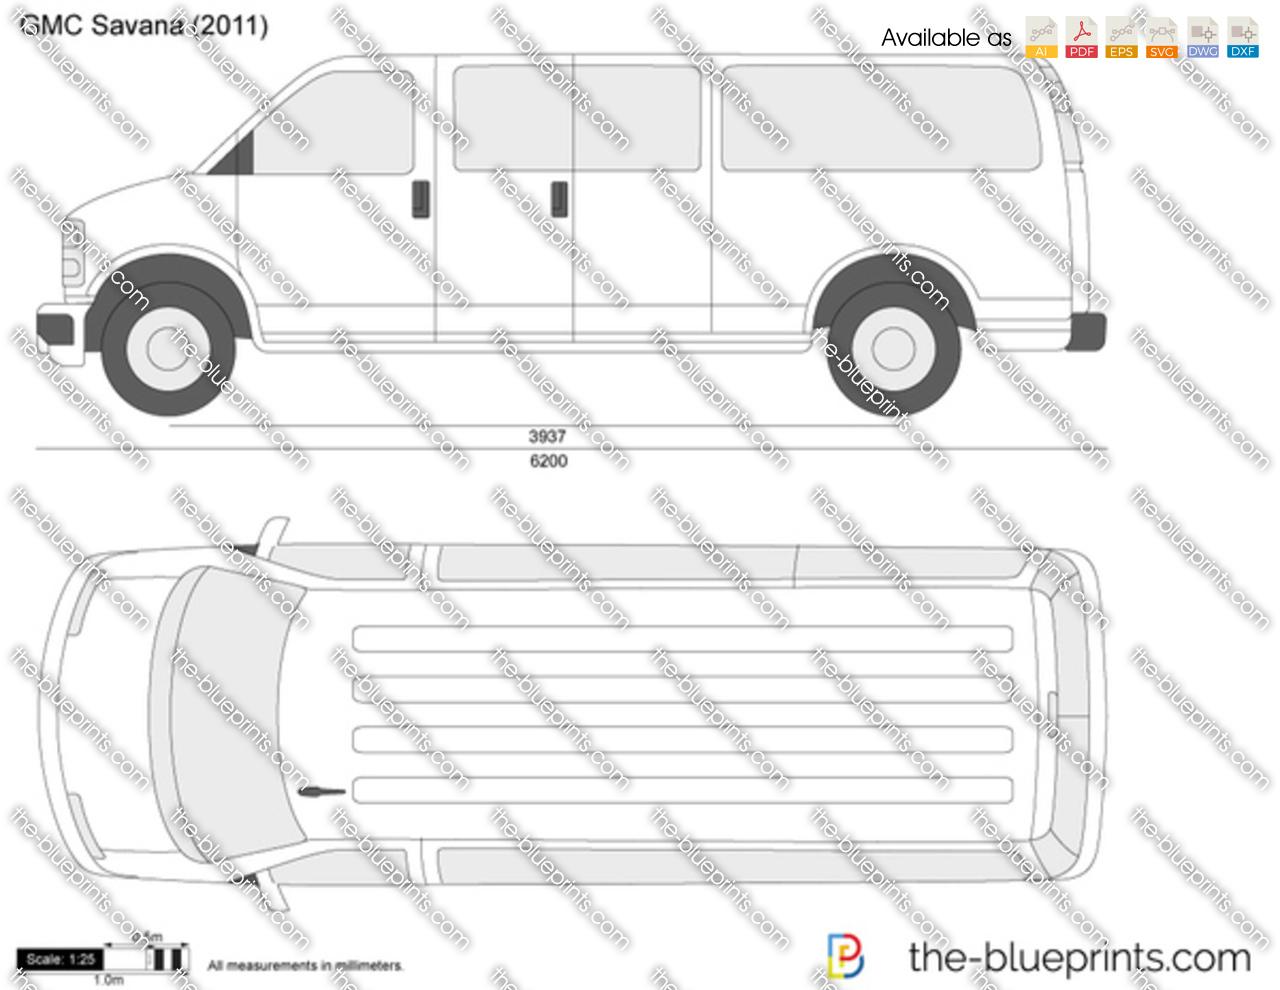 GMC Savana Extended Wheelbase